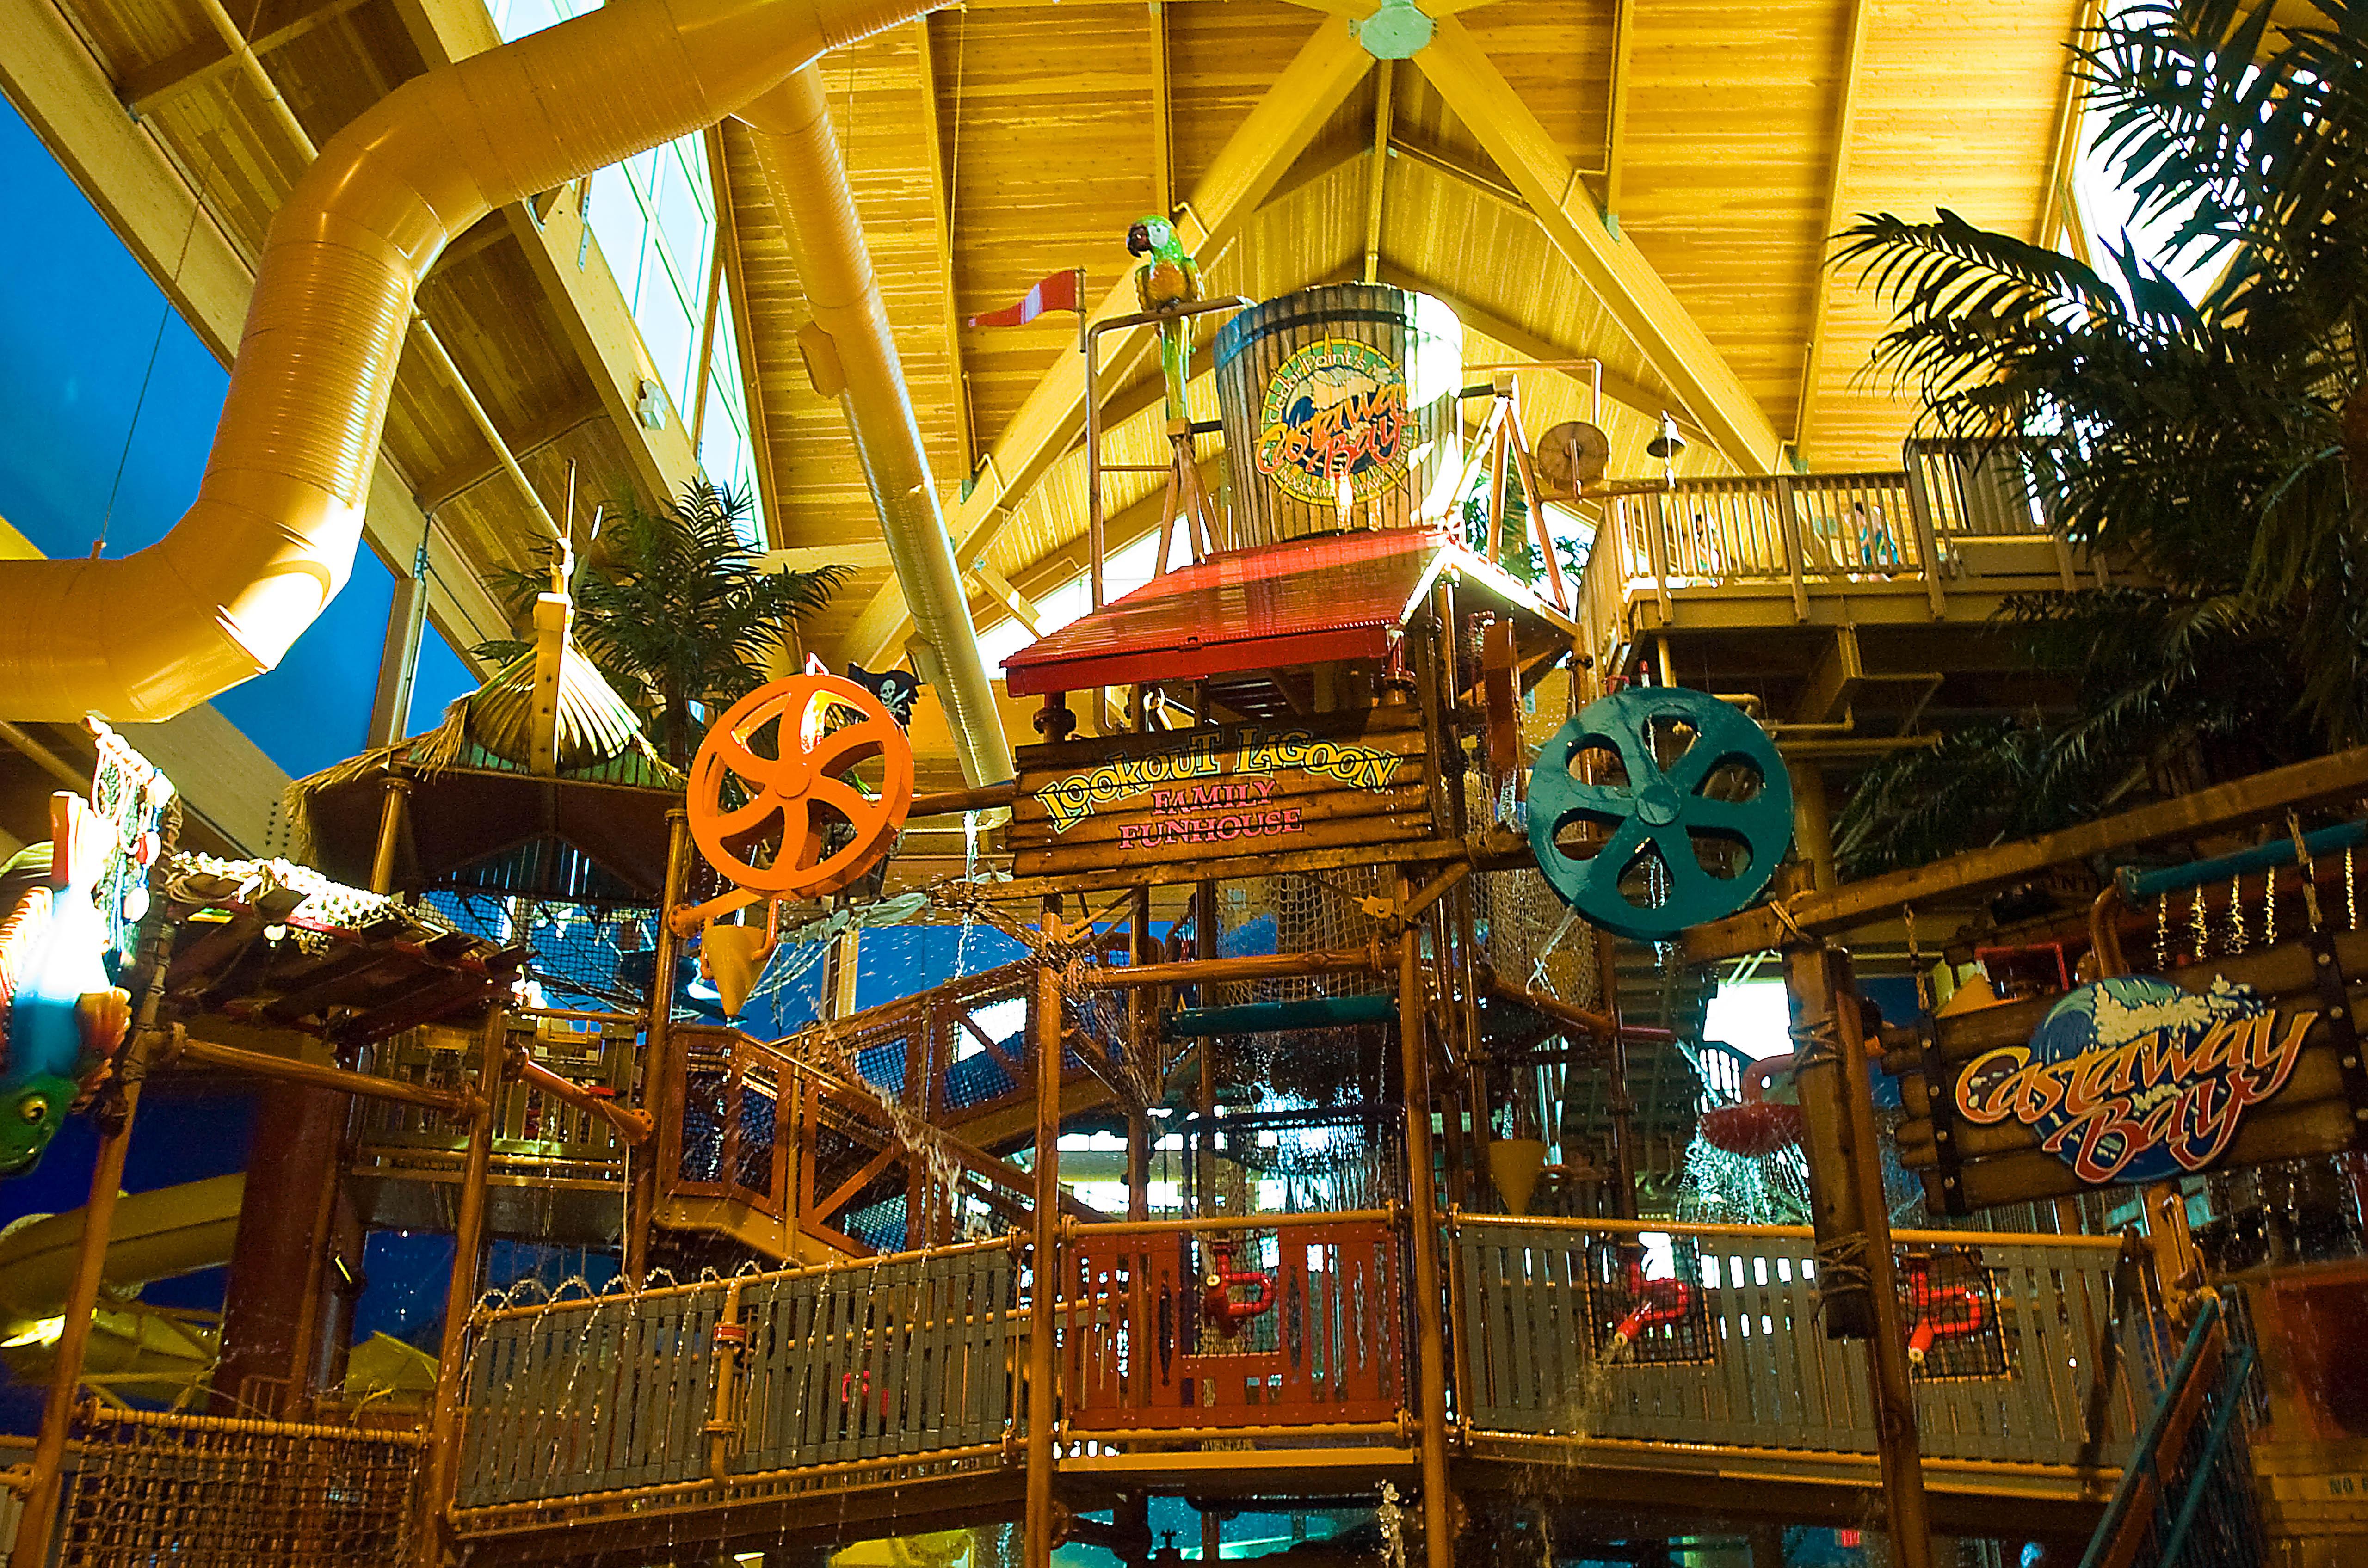 Maui Sands Ohio Kids Room Hotel Impossible Did